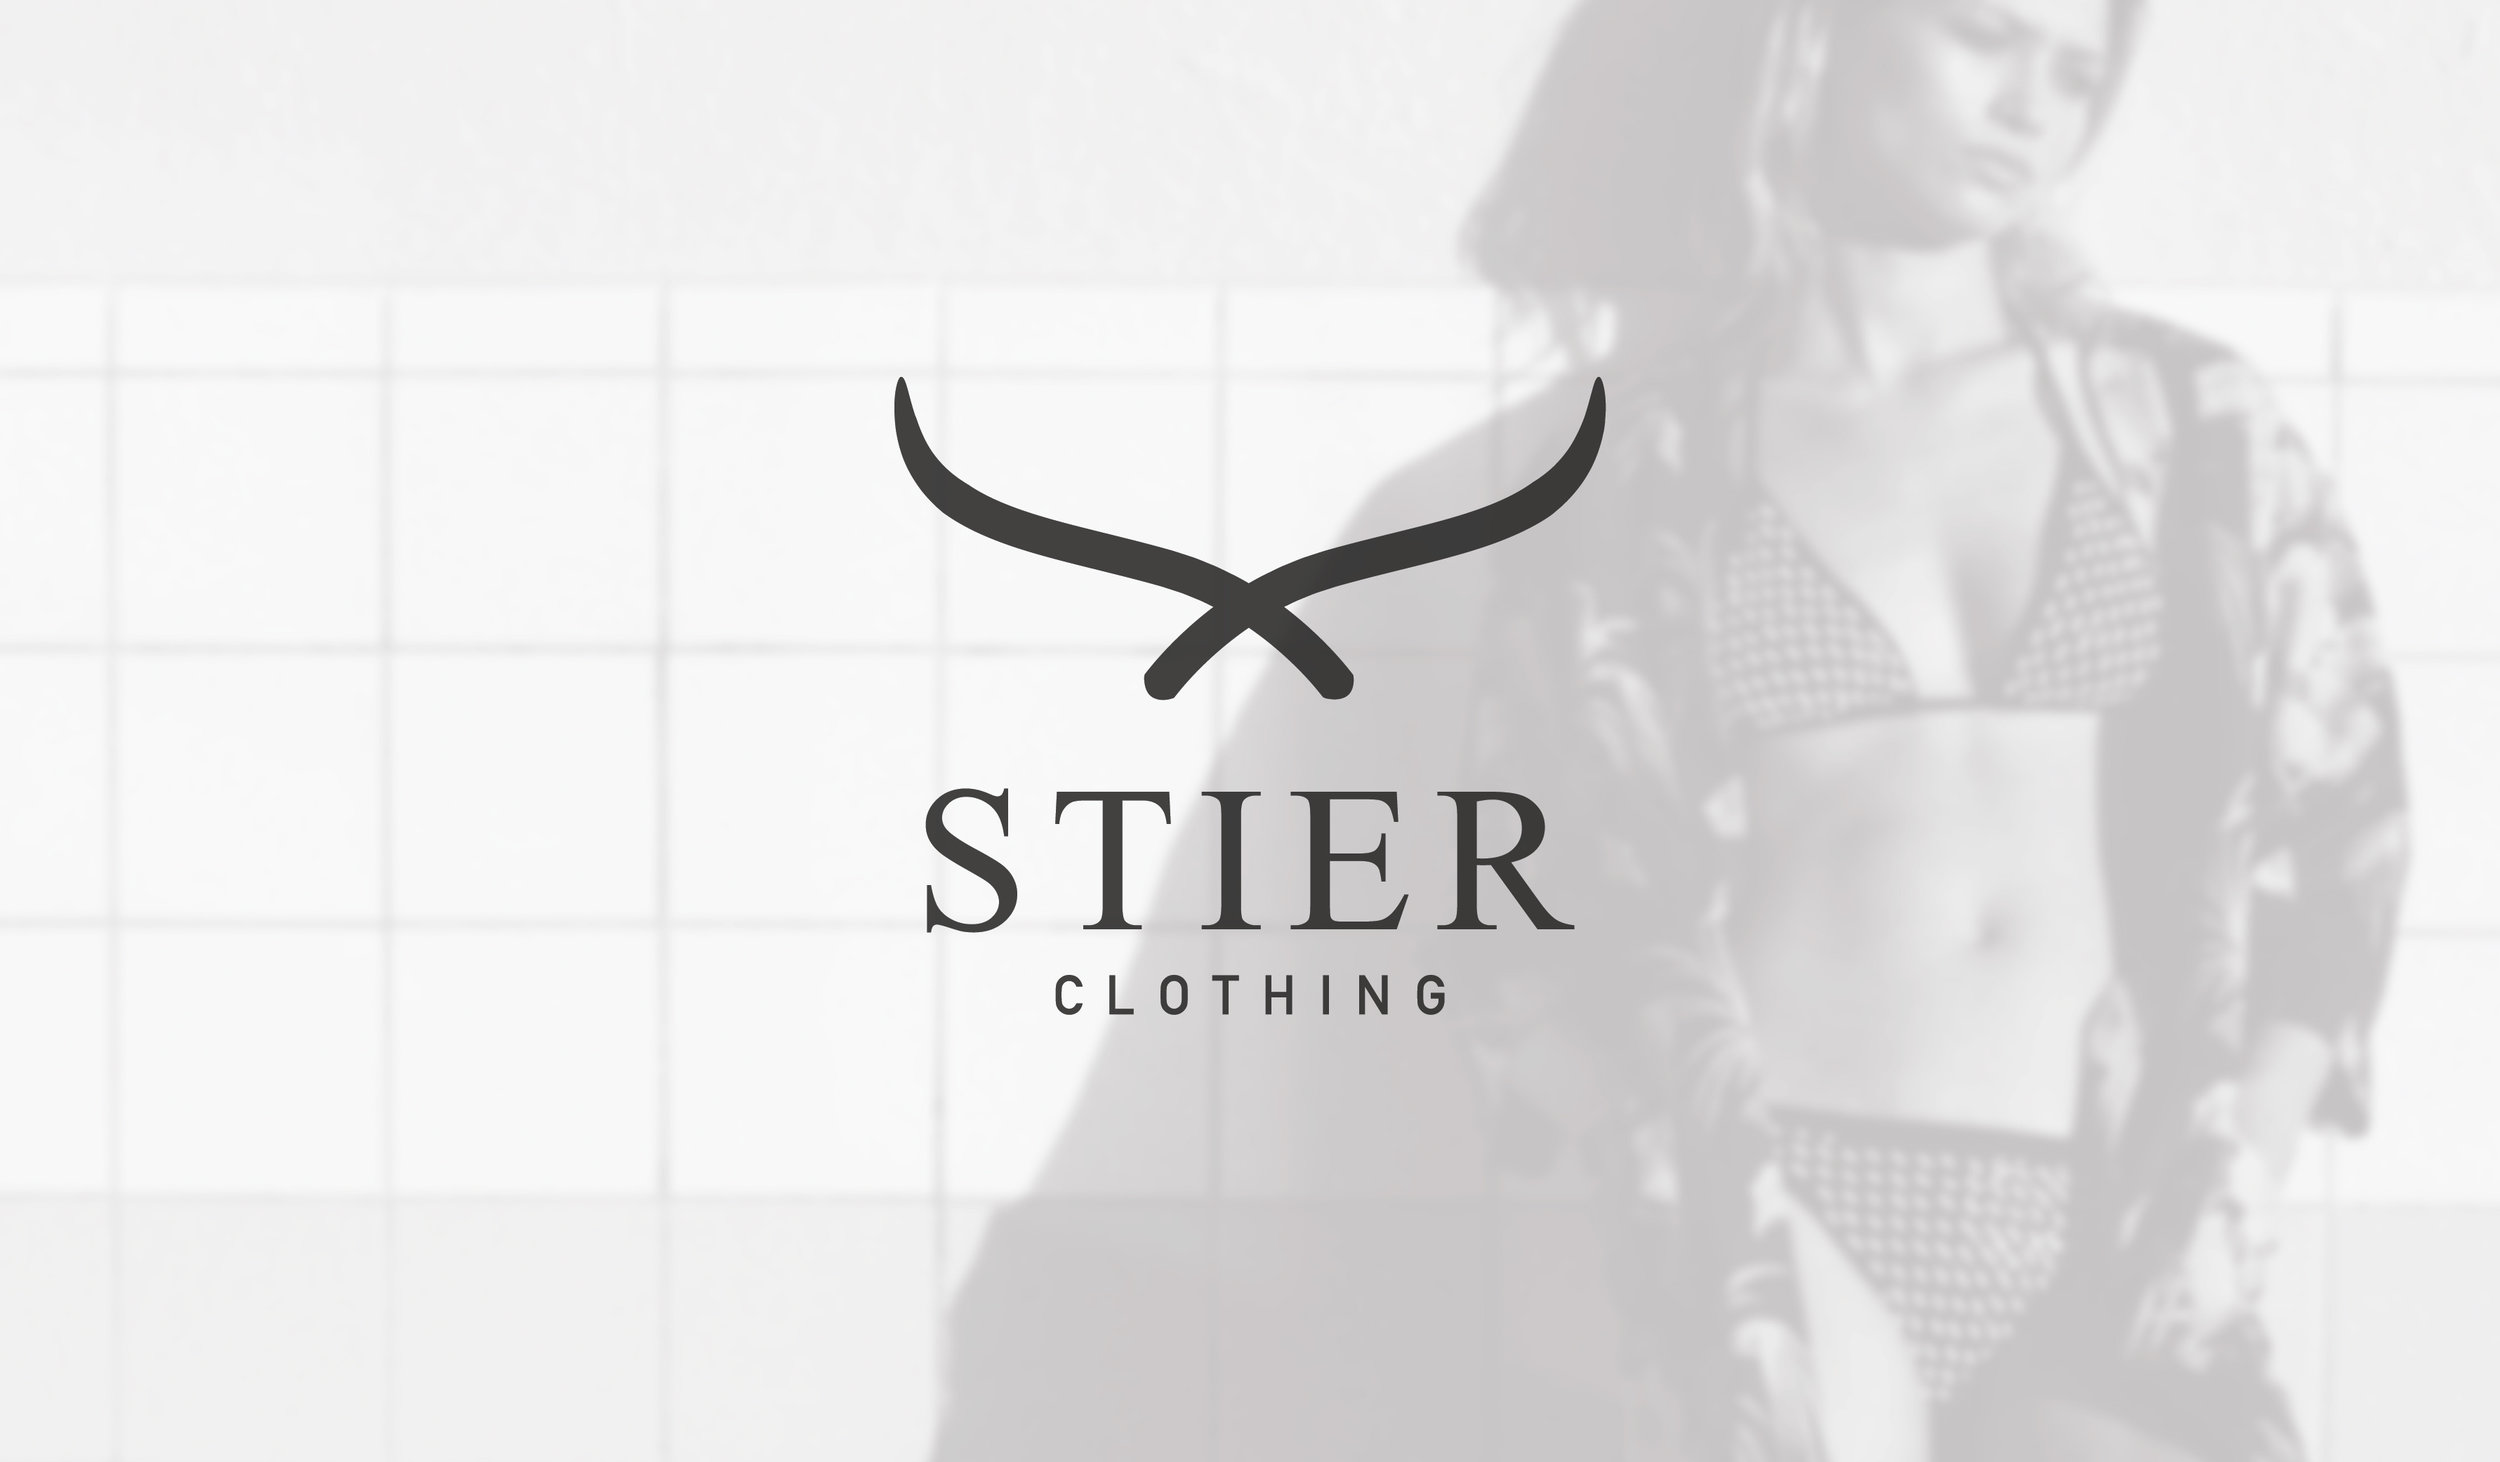 Stier Clothing Branding